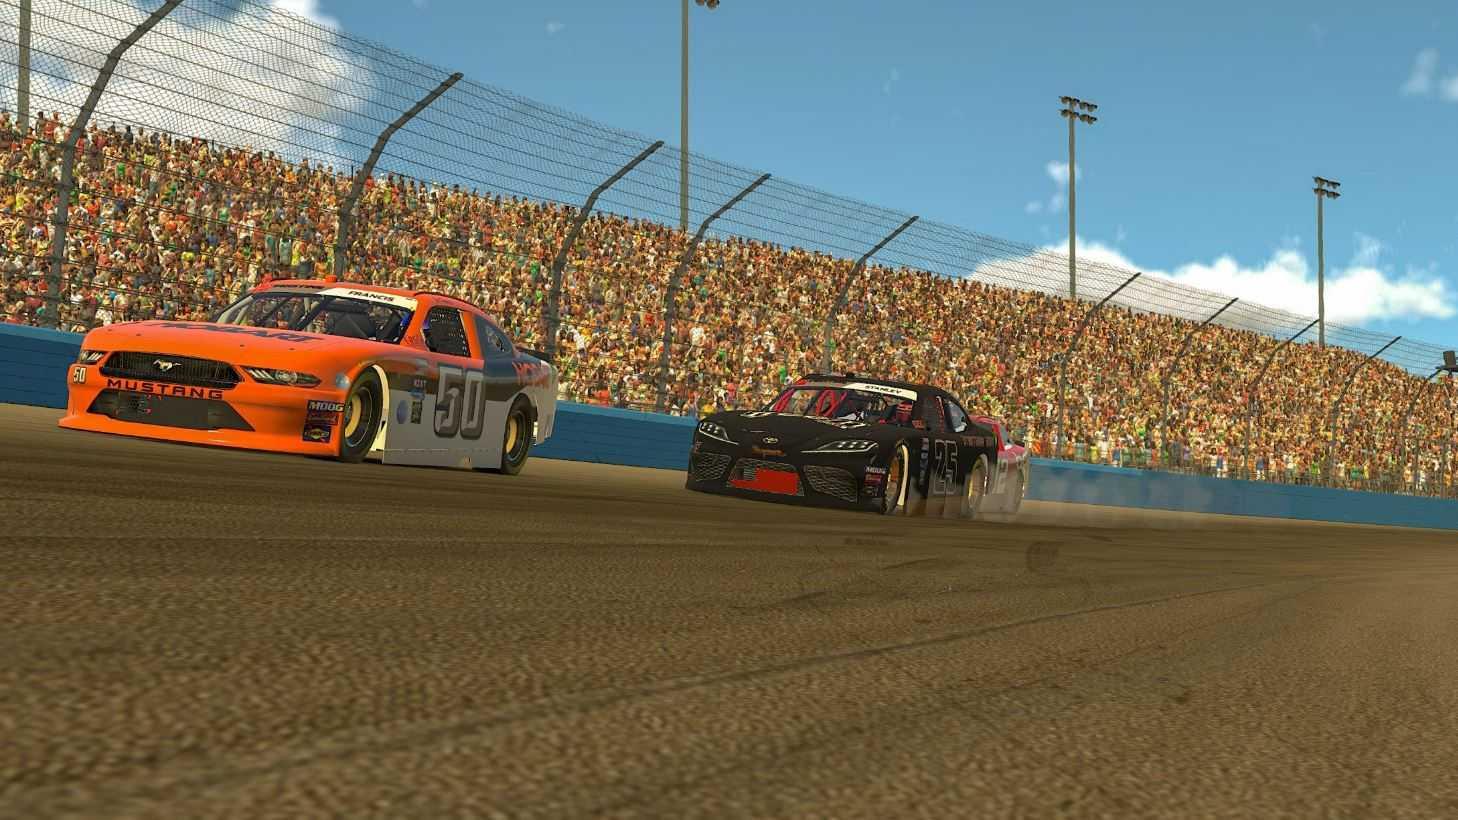 ERSCA: Scott Crumps Phoenix Raceway